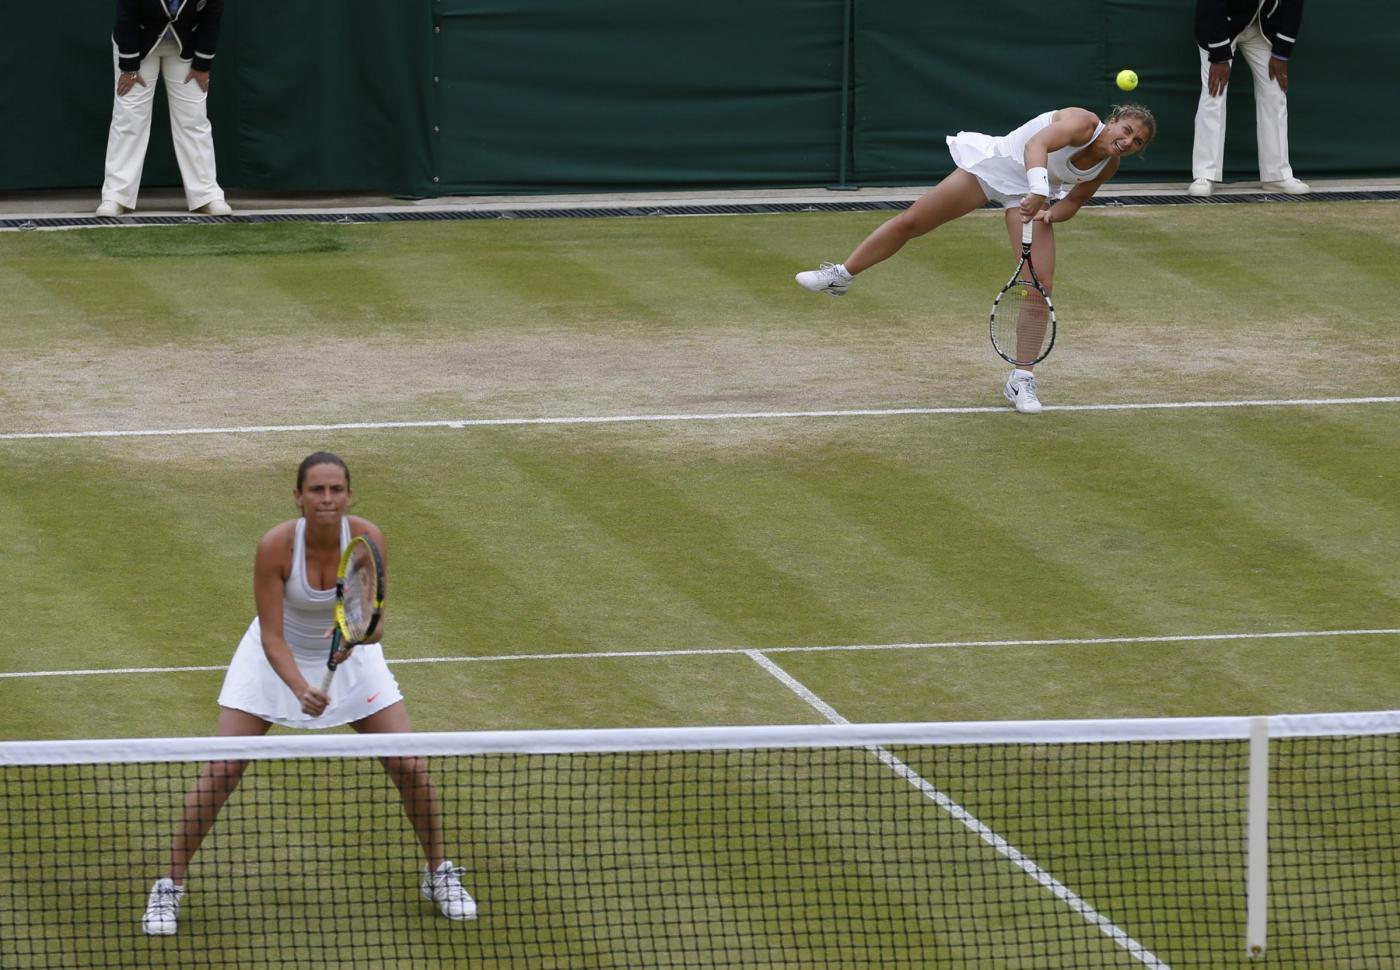 Wimbledon 2014 Errani Vinci